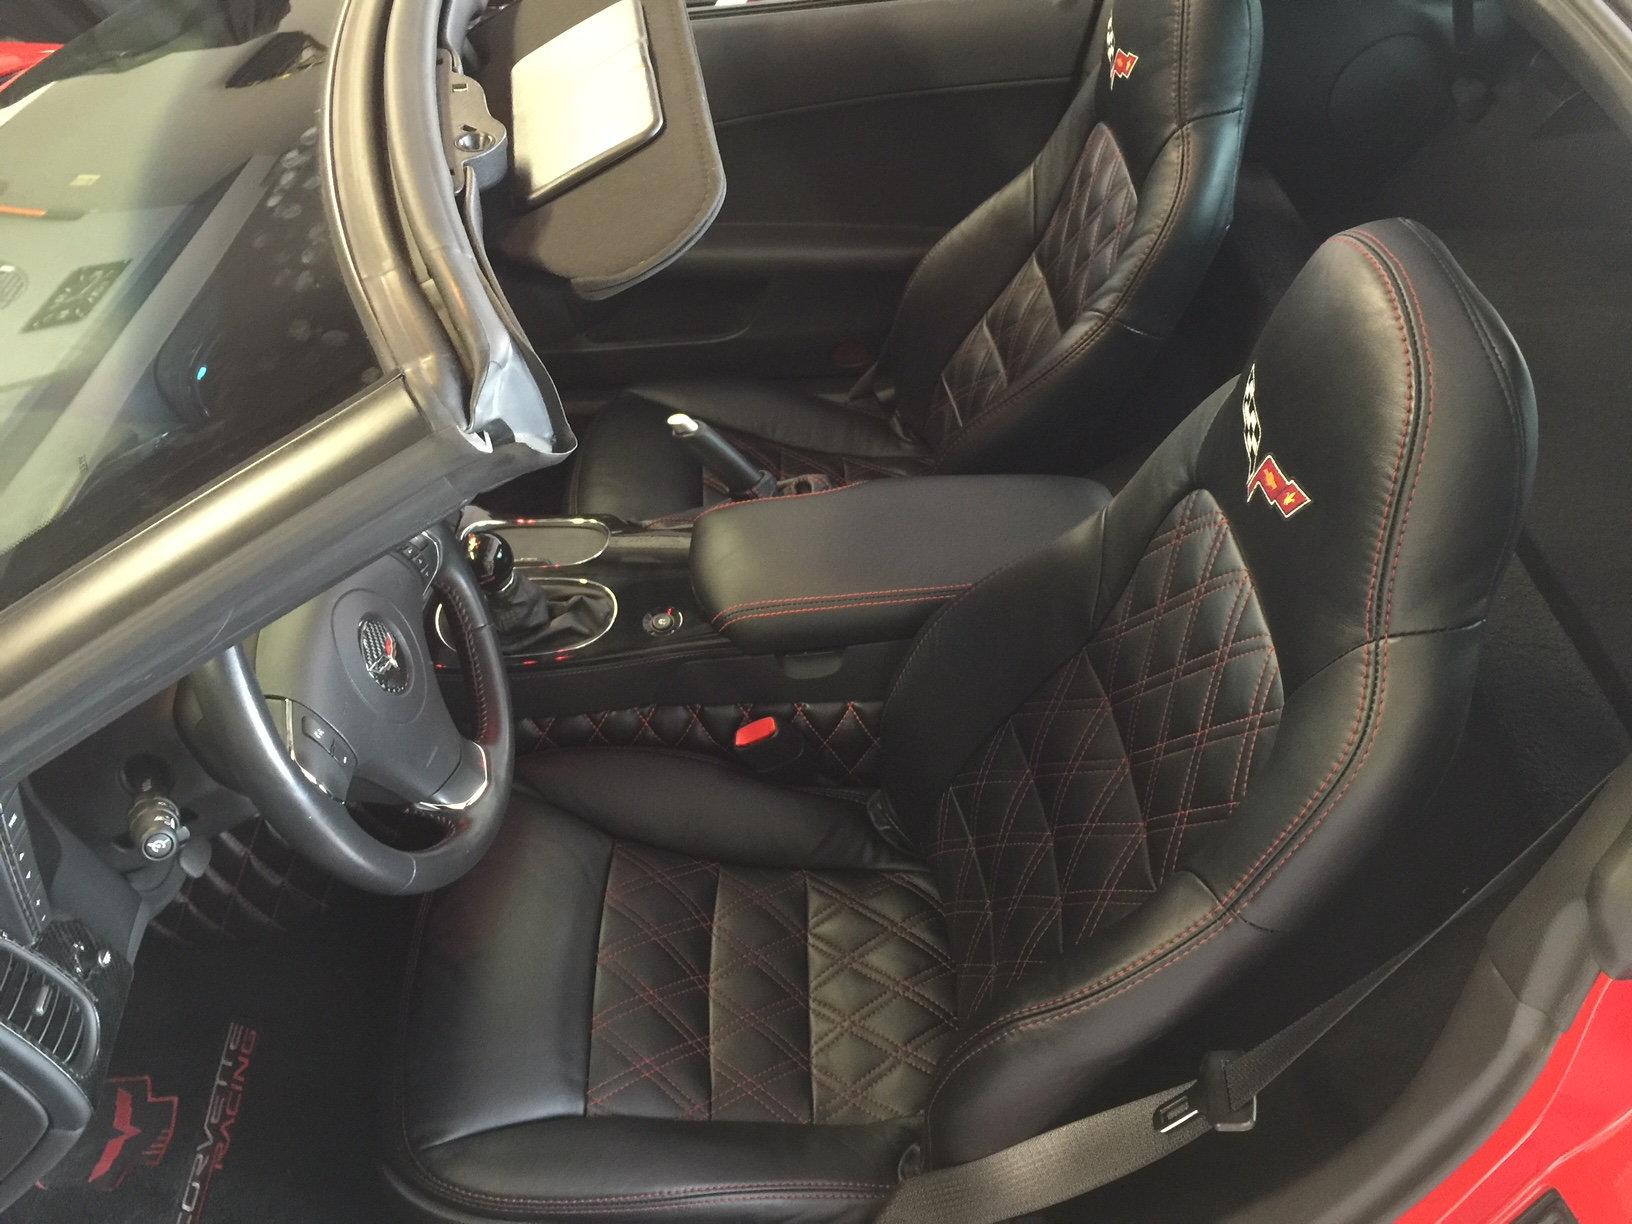 Seat Covers With Double Diamond Stitching Corvetteforum